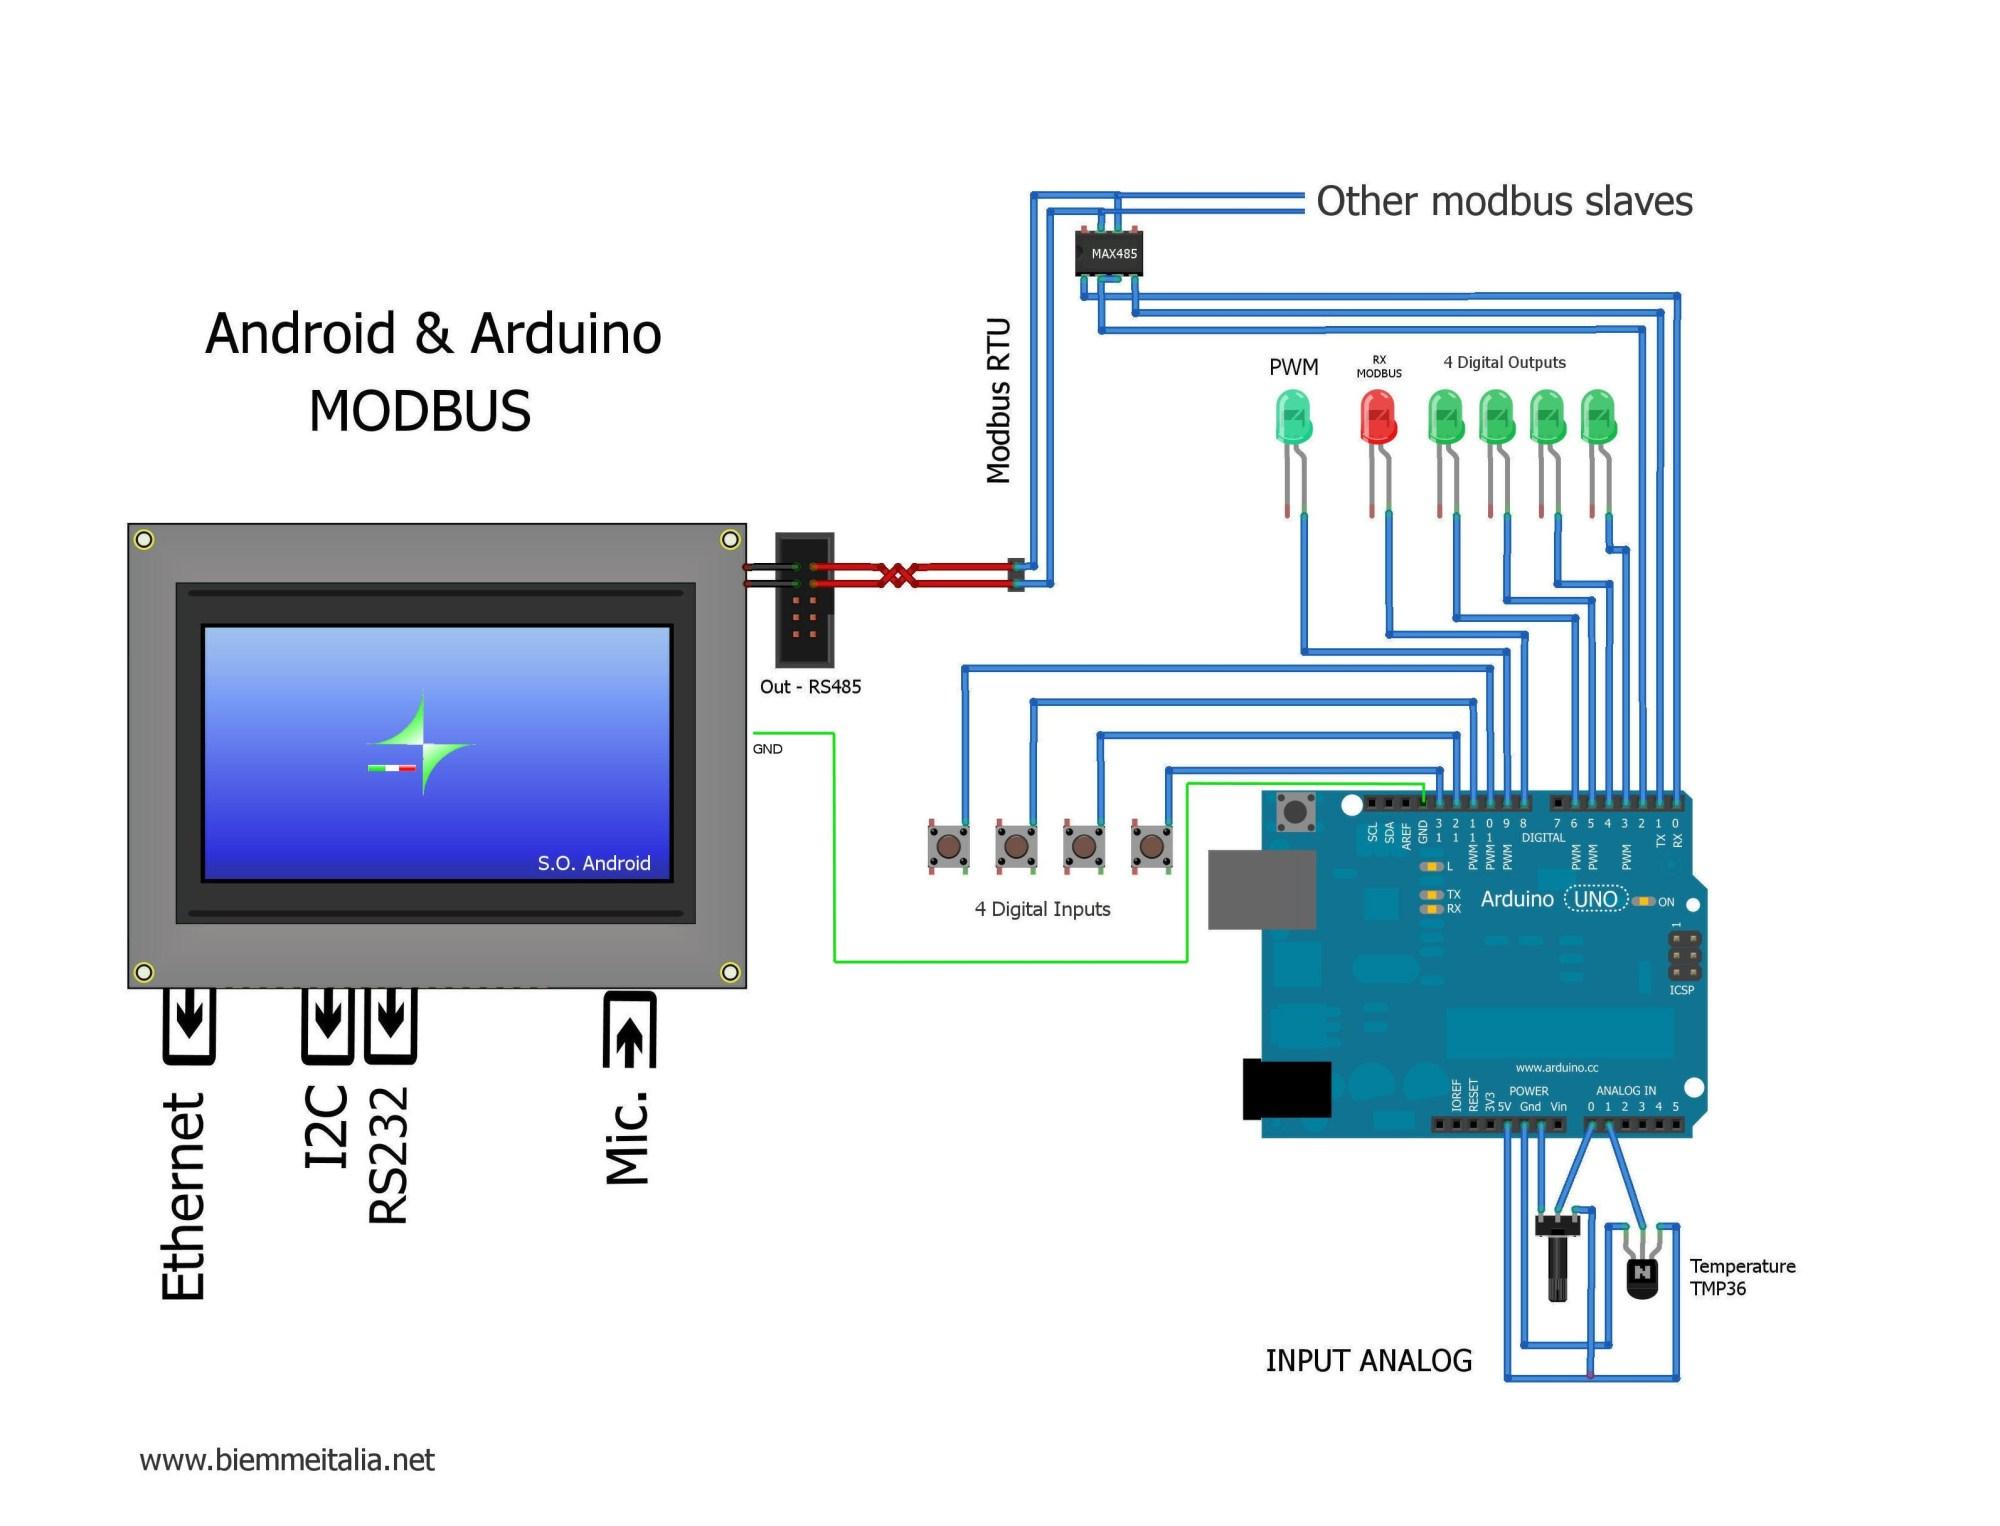 hight resolution of modbus rs485 wiring diagram nnj kickernight de u2022rs485 rj45 wiring diagram wiring library rh 86